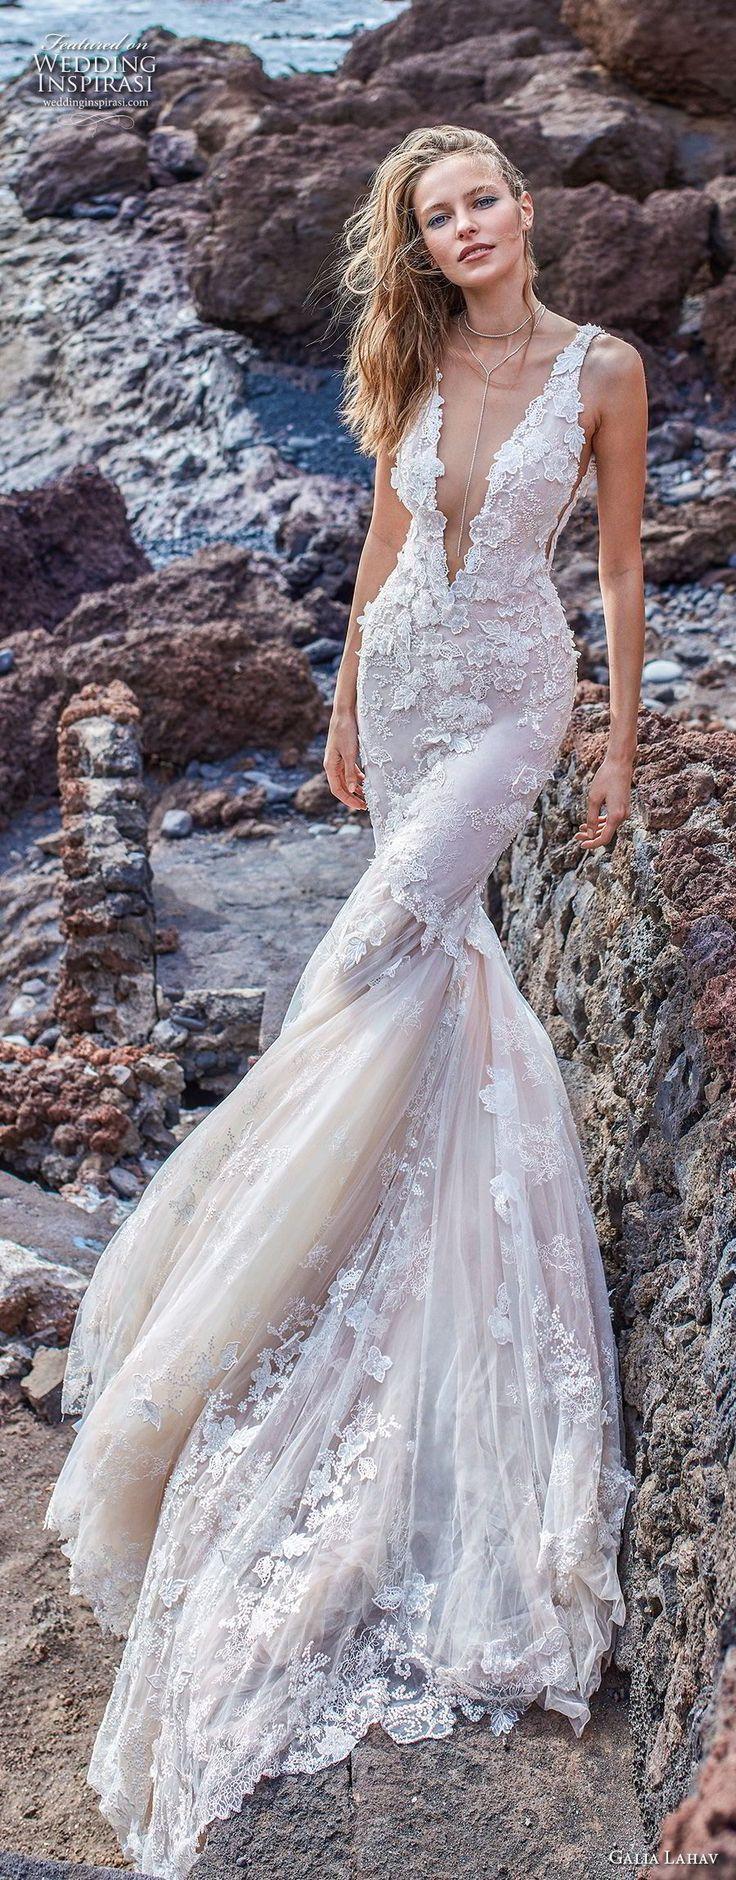 galia lahav gala 2018 bridal sleeveless deep v neck heavily embellished bodice open side elegant sexy mermaid wedding dress v back chapel train (3) lv -- Gala by Galia Lahav Collection No. 5 Wedding Dresses #wedding #weddings #bridal